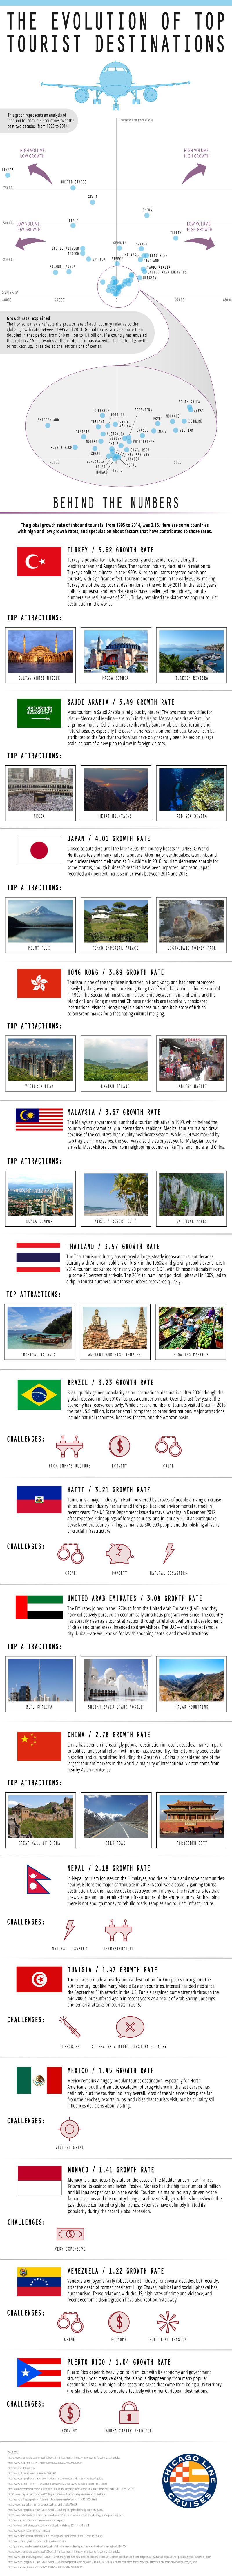 The Evolution of Top Tourist Destinations